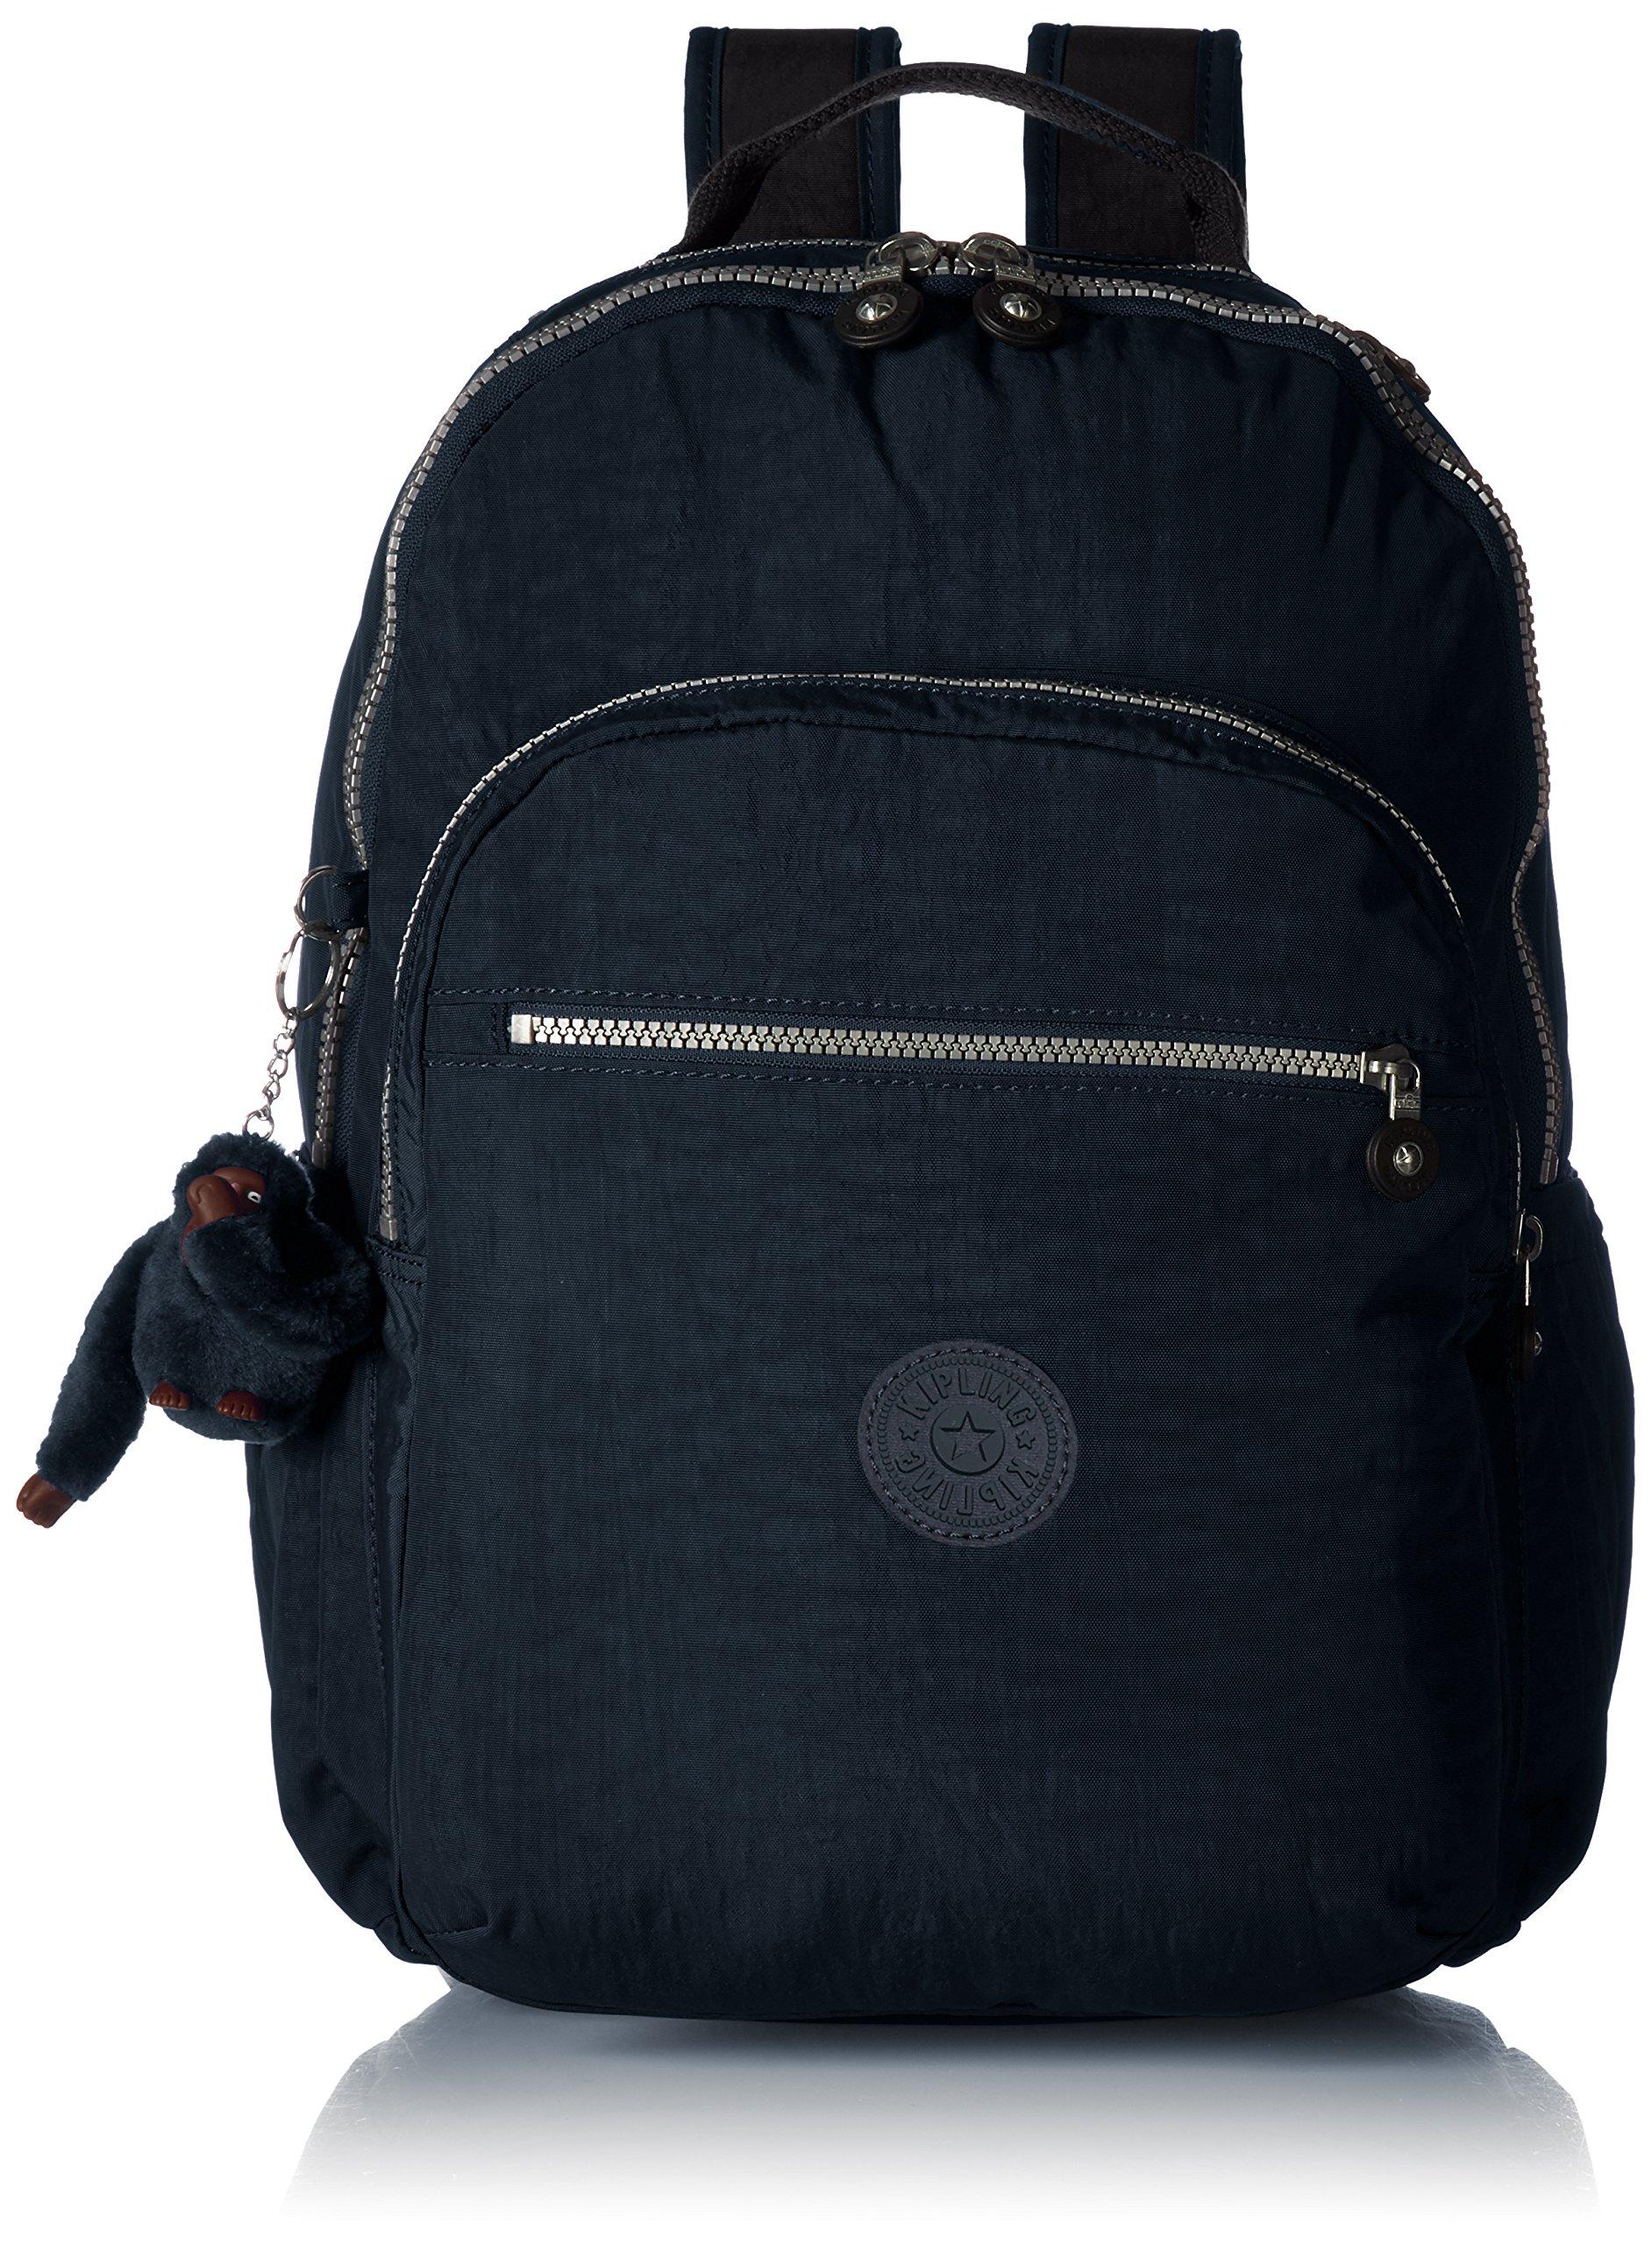 Kipling Seoul Go Laptop, Padded, Adjustable Backpack Straps, Zip Closure, True Blue by Kipling (Image #1)